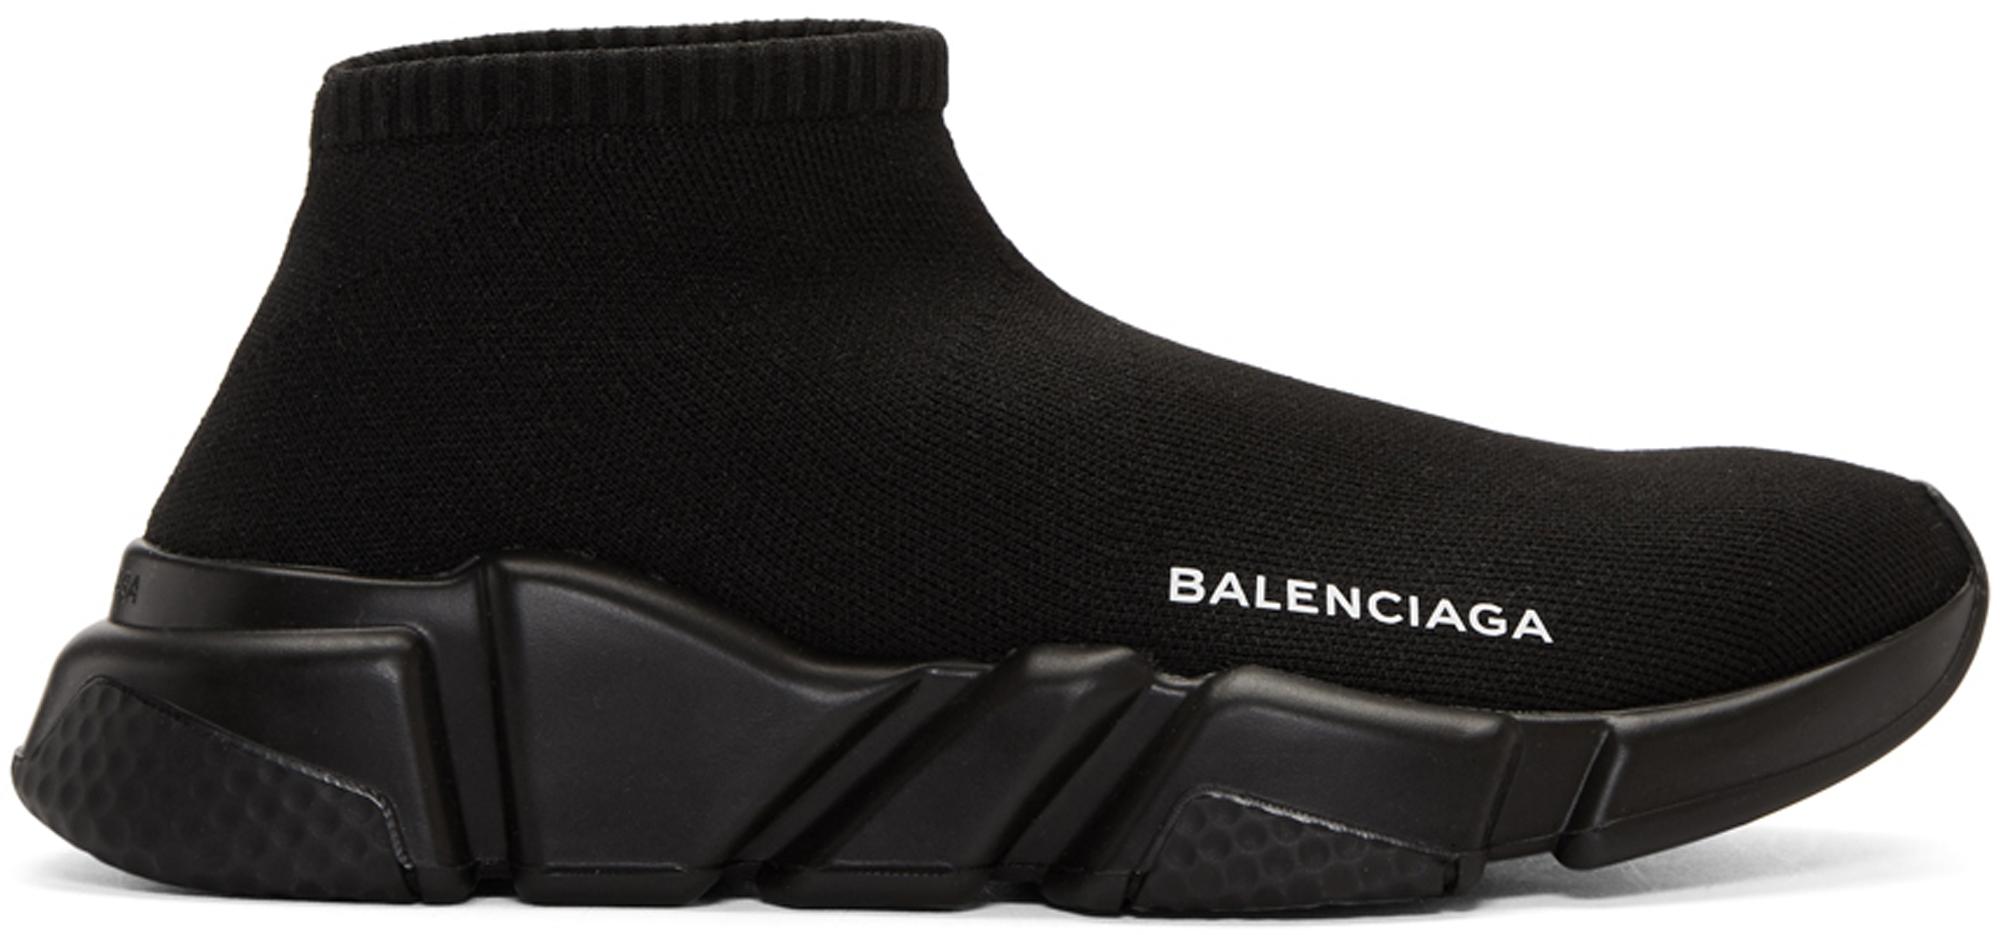 Balenciaga Speed Trainer Low Black (W